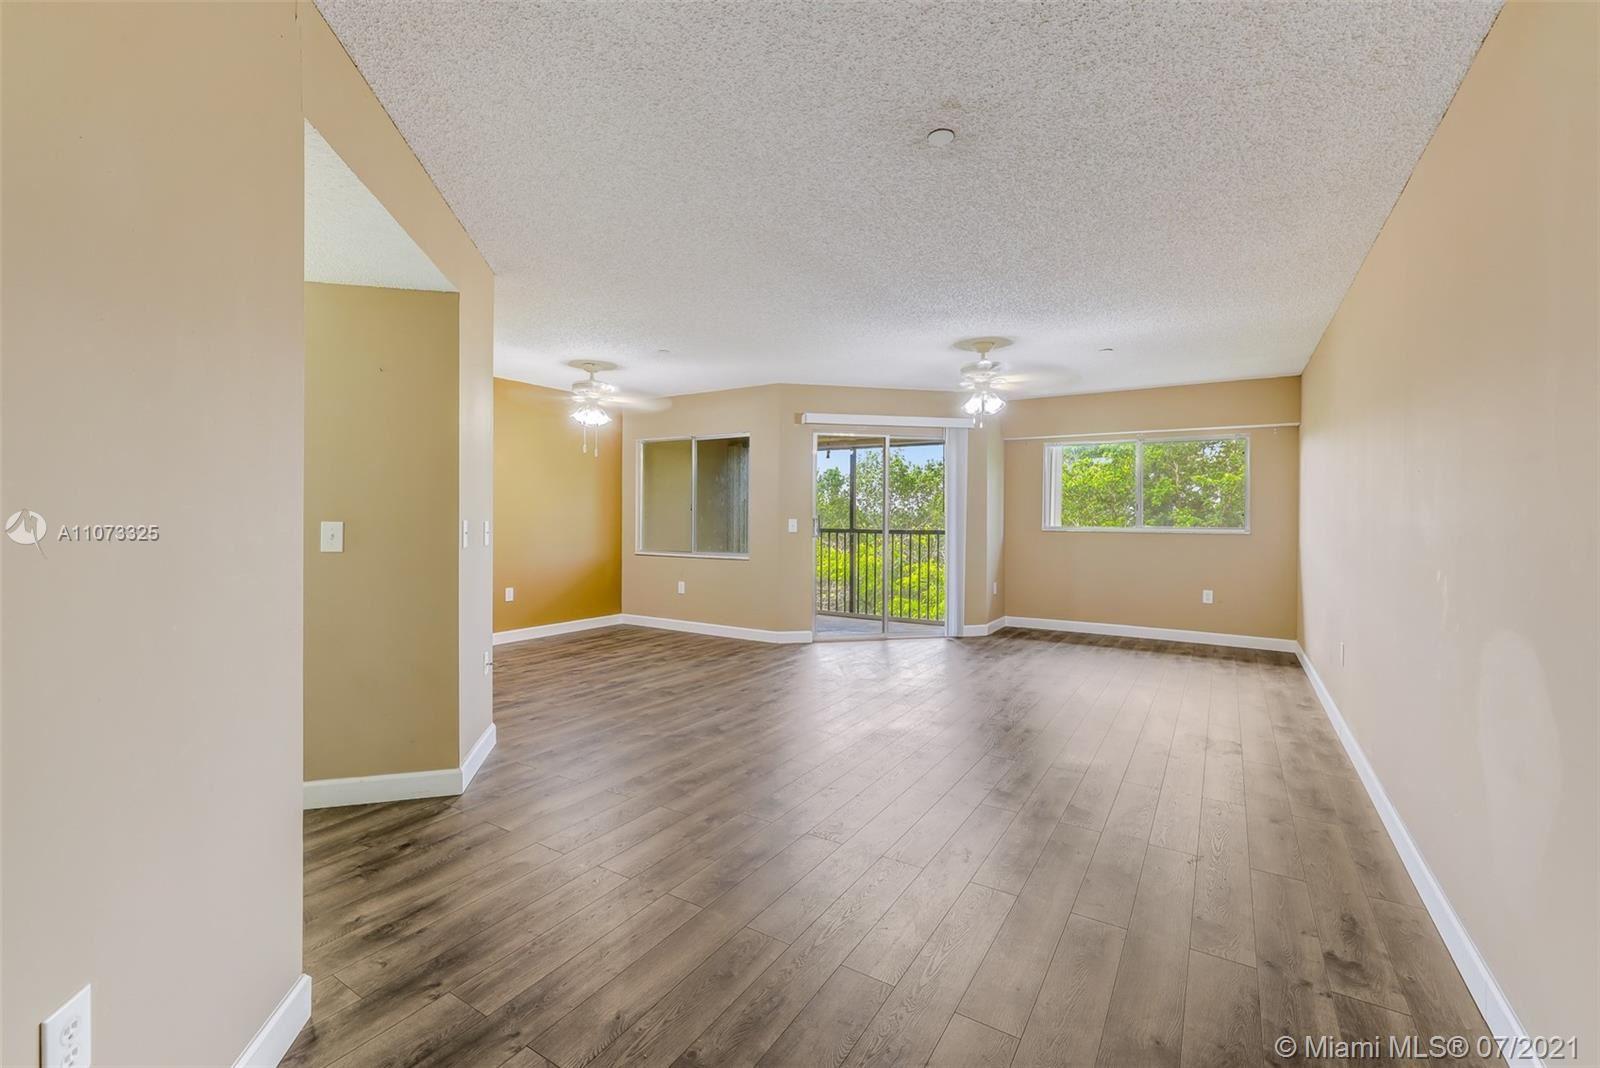 900 SW 142nd Ave #412L, Pembroke Pines, FL 33027 - #: A11073325